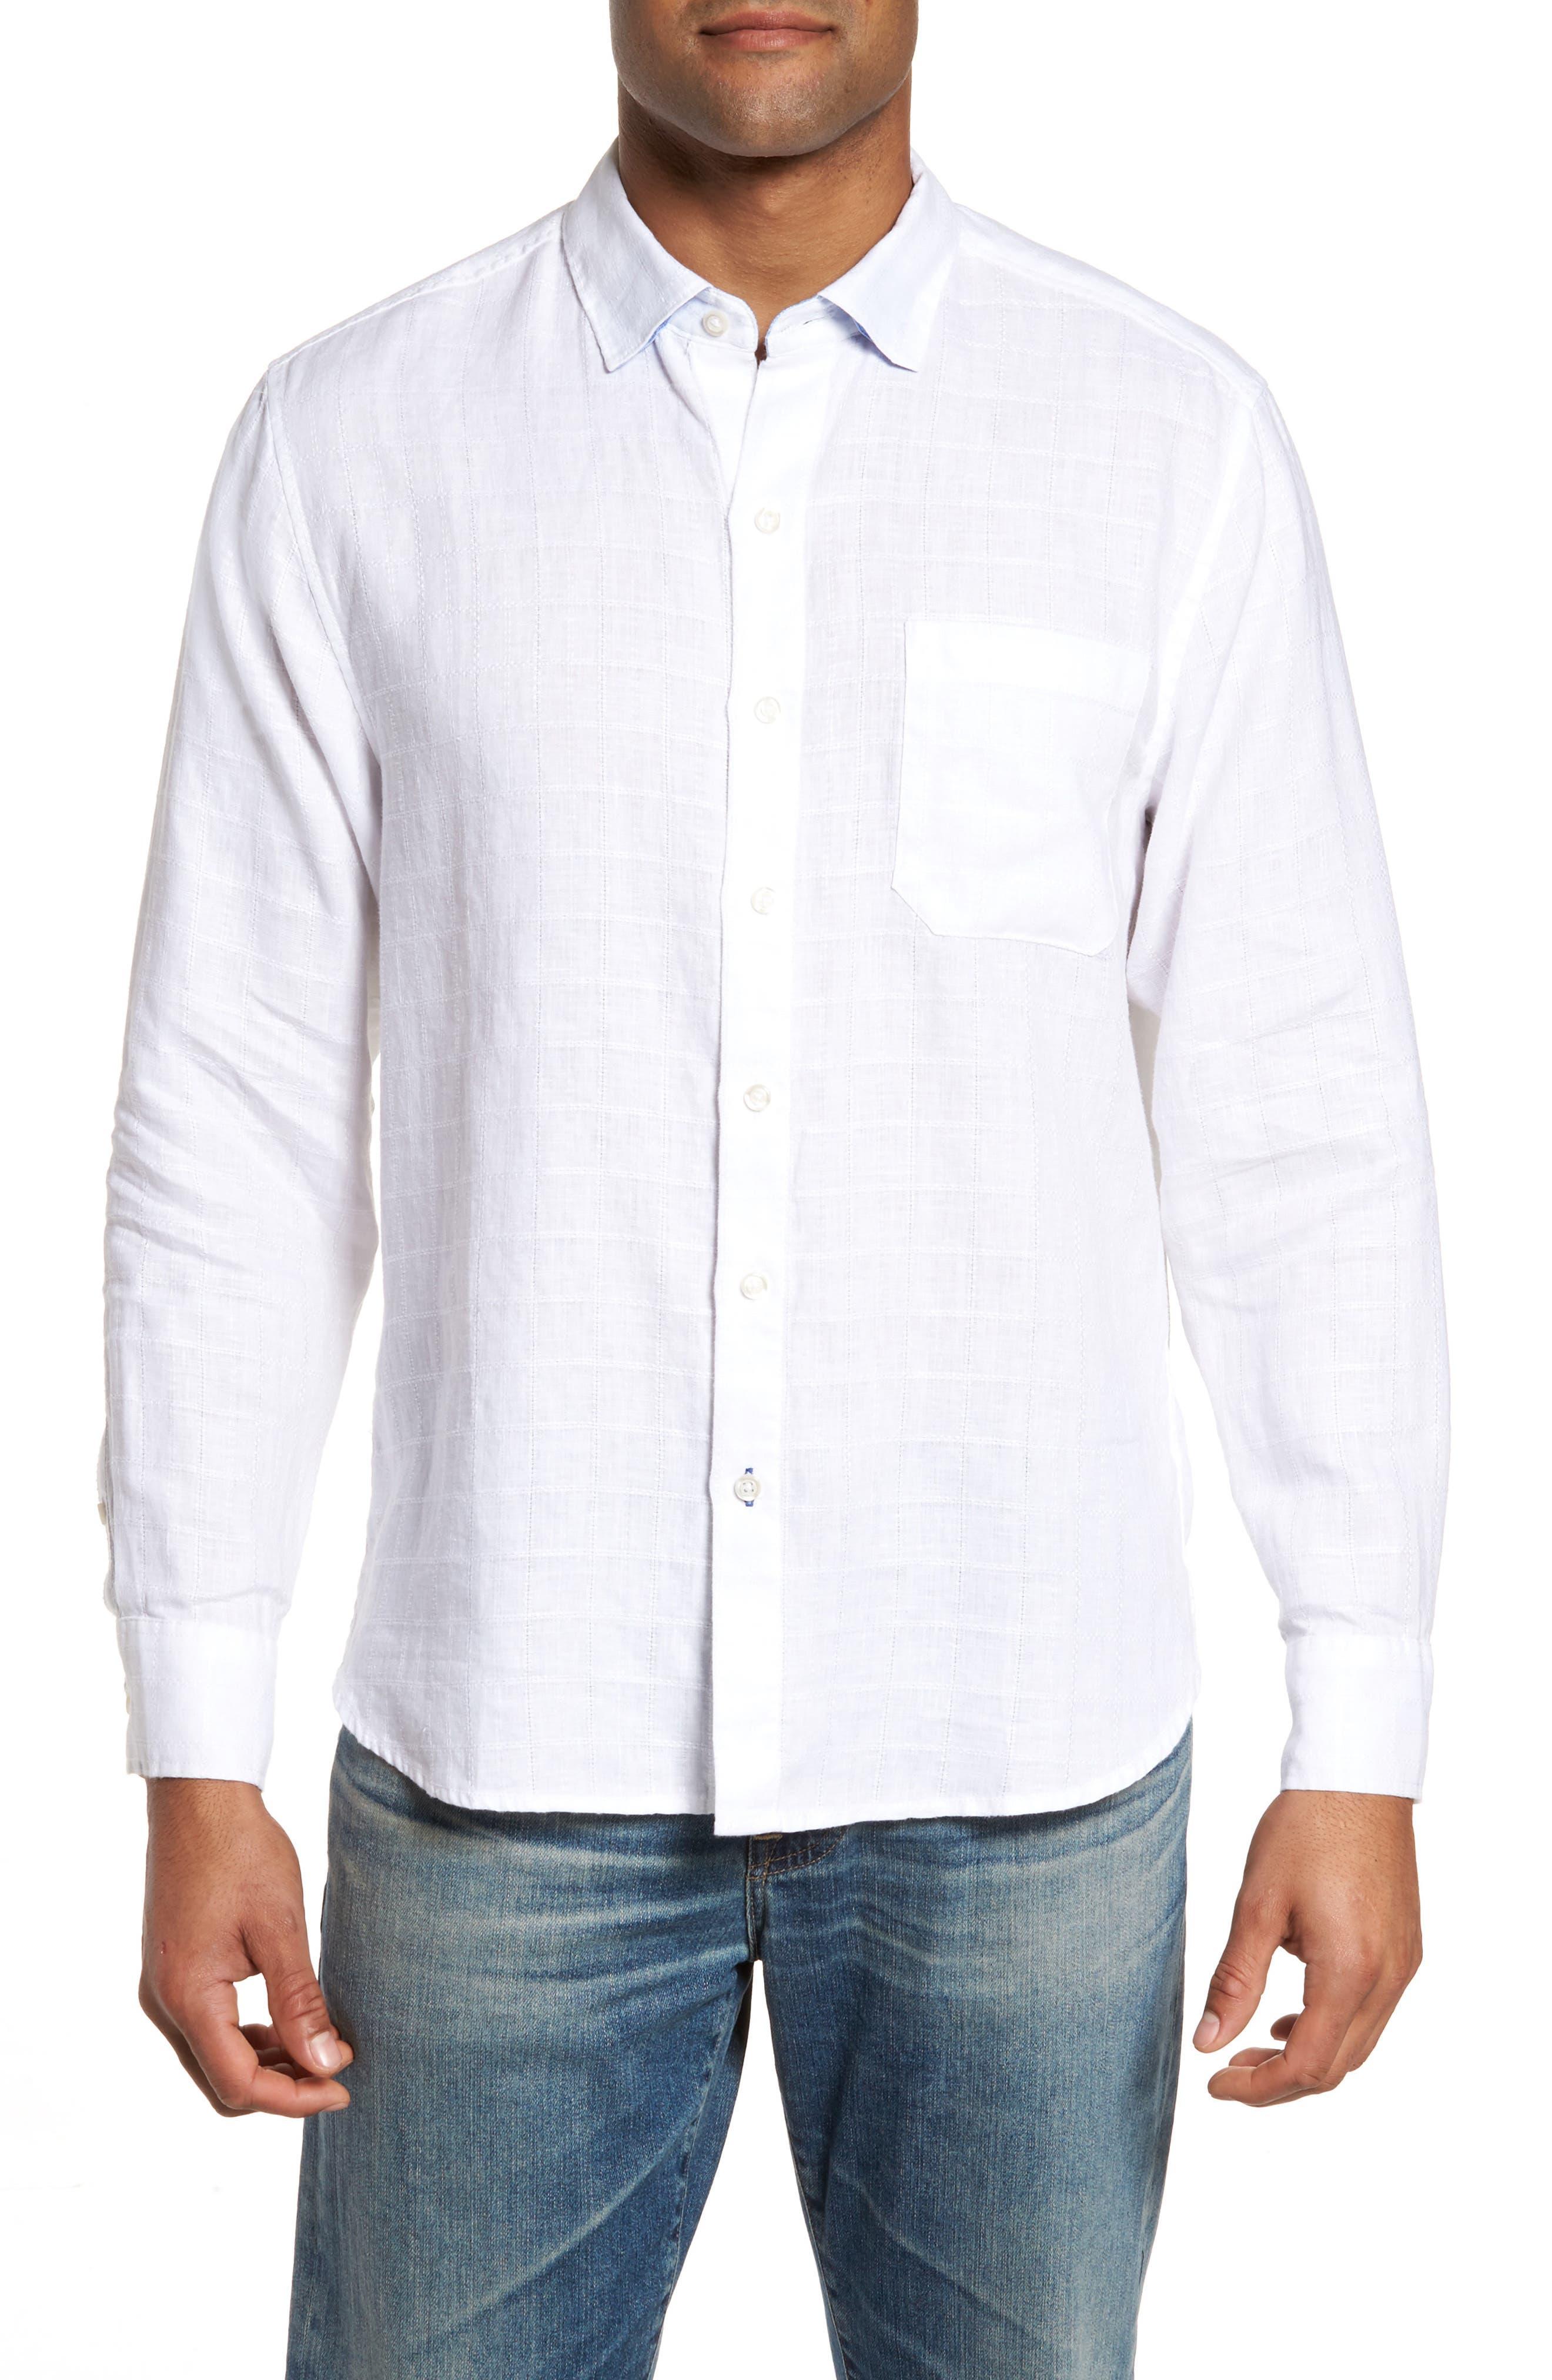 Main Image - Tommy Bahama Costa Cera Linen Sport Shirt